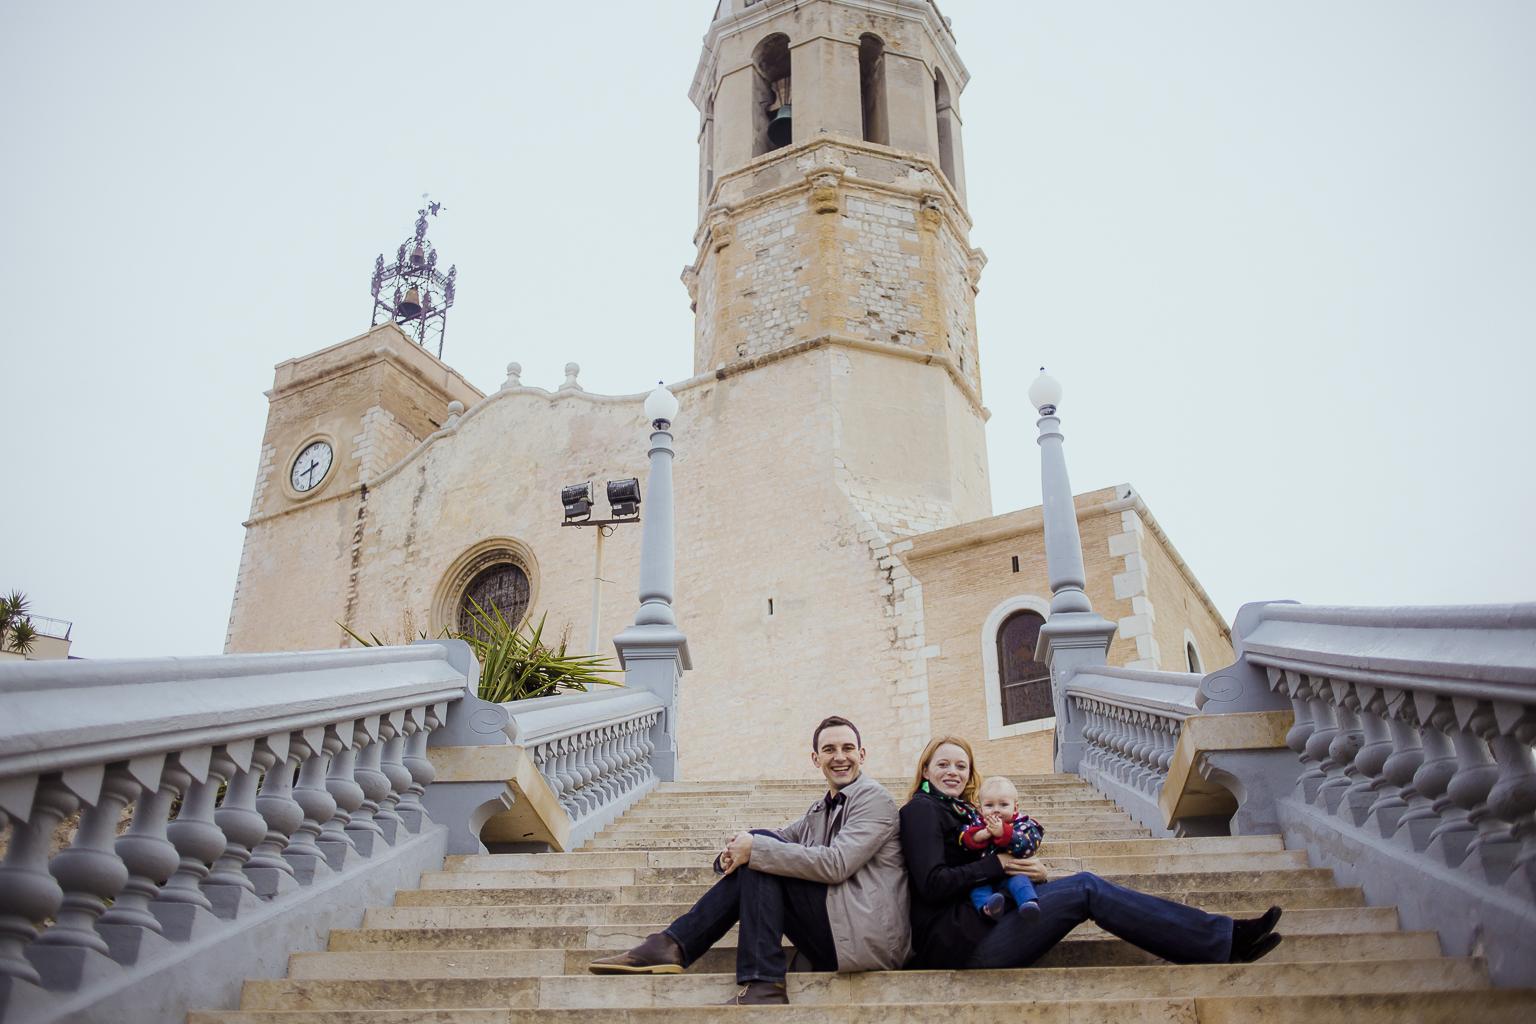 Fotógrafo de familia Barcelona :: Sitges :: Fotografía familiar natural :: Fotografía de familia en la playa :: Fotografía infantil exterior :: Día nublado :: Best Barcelona photographer